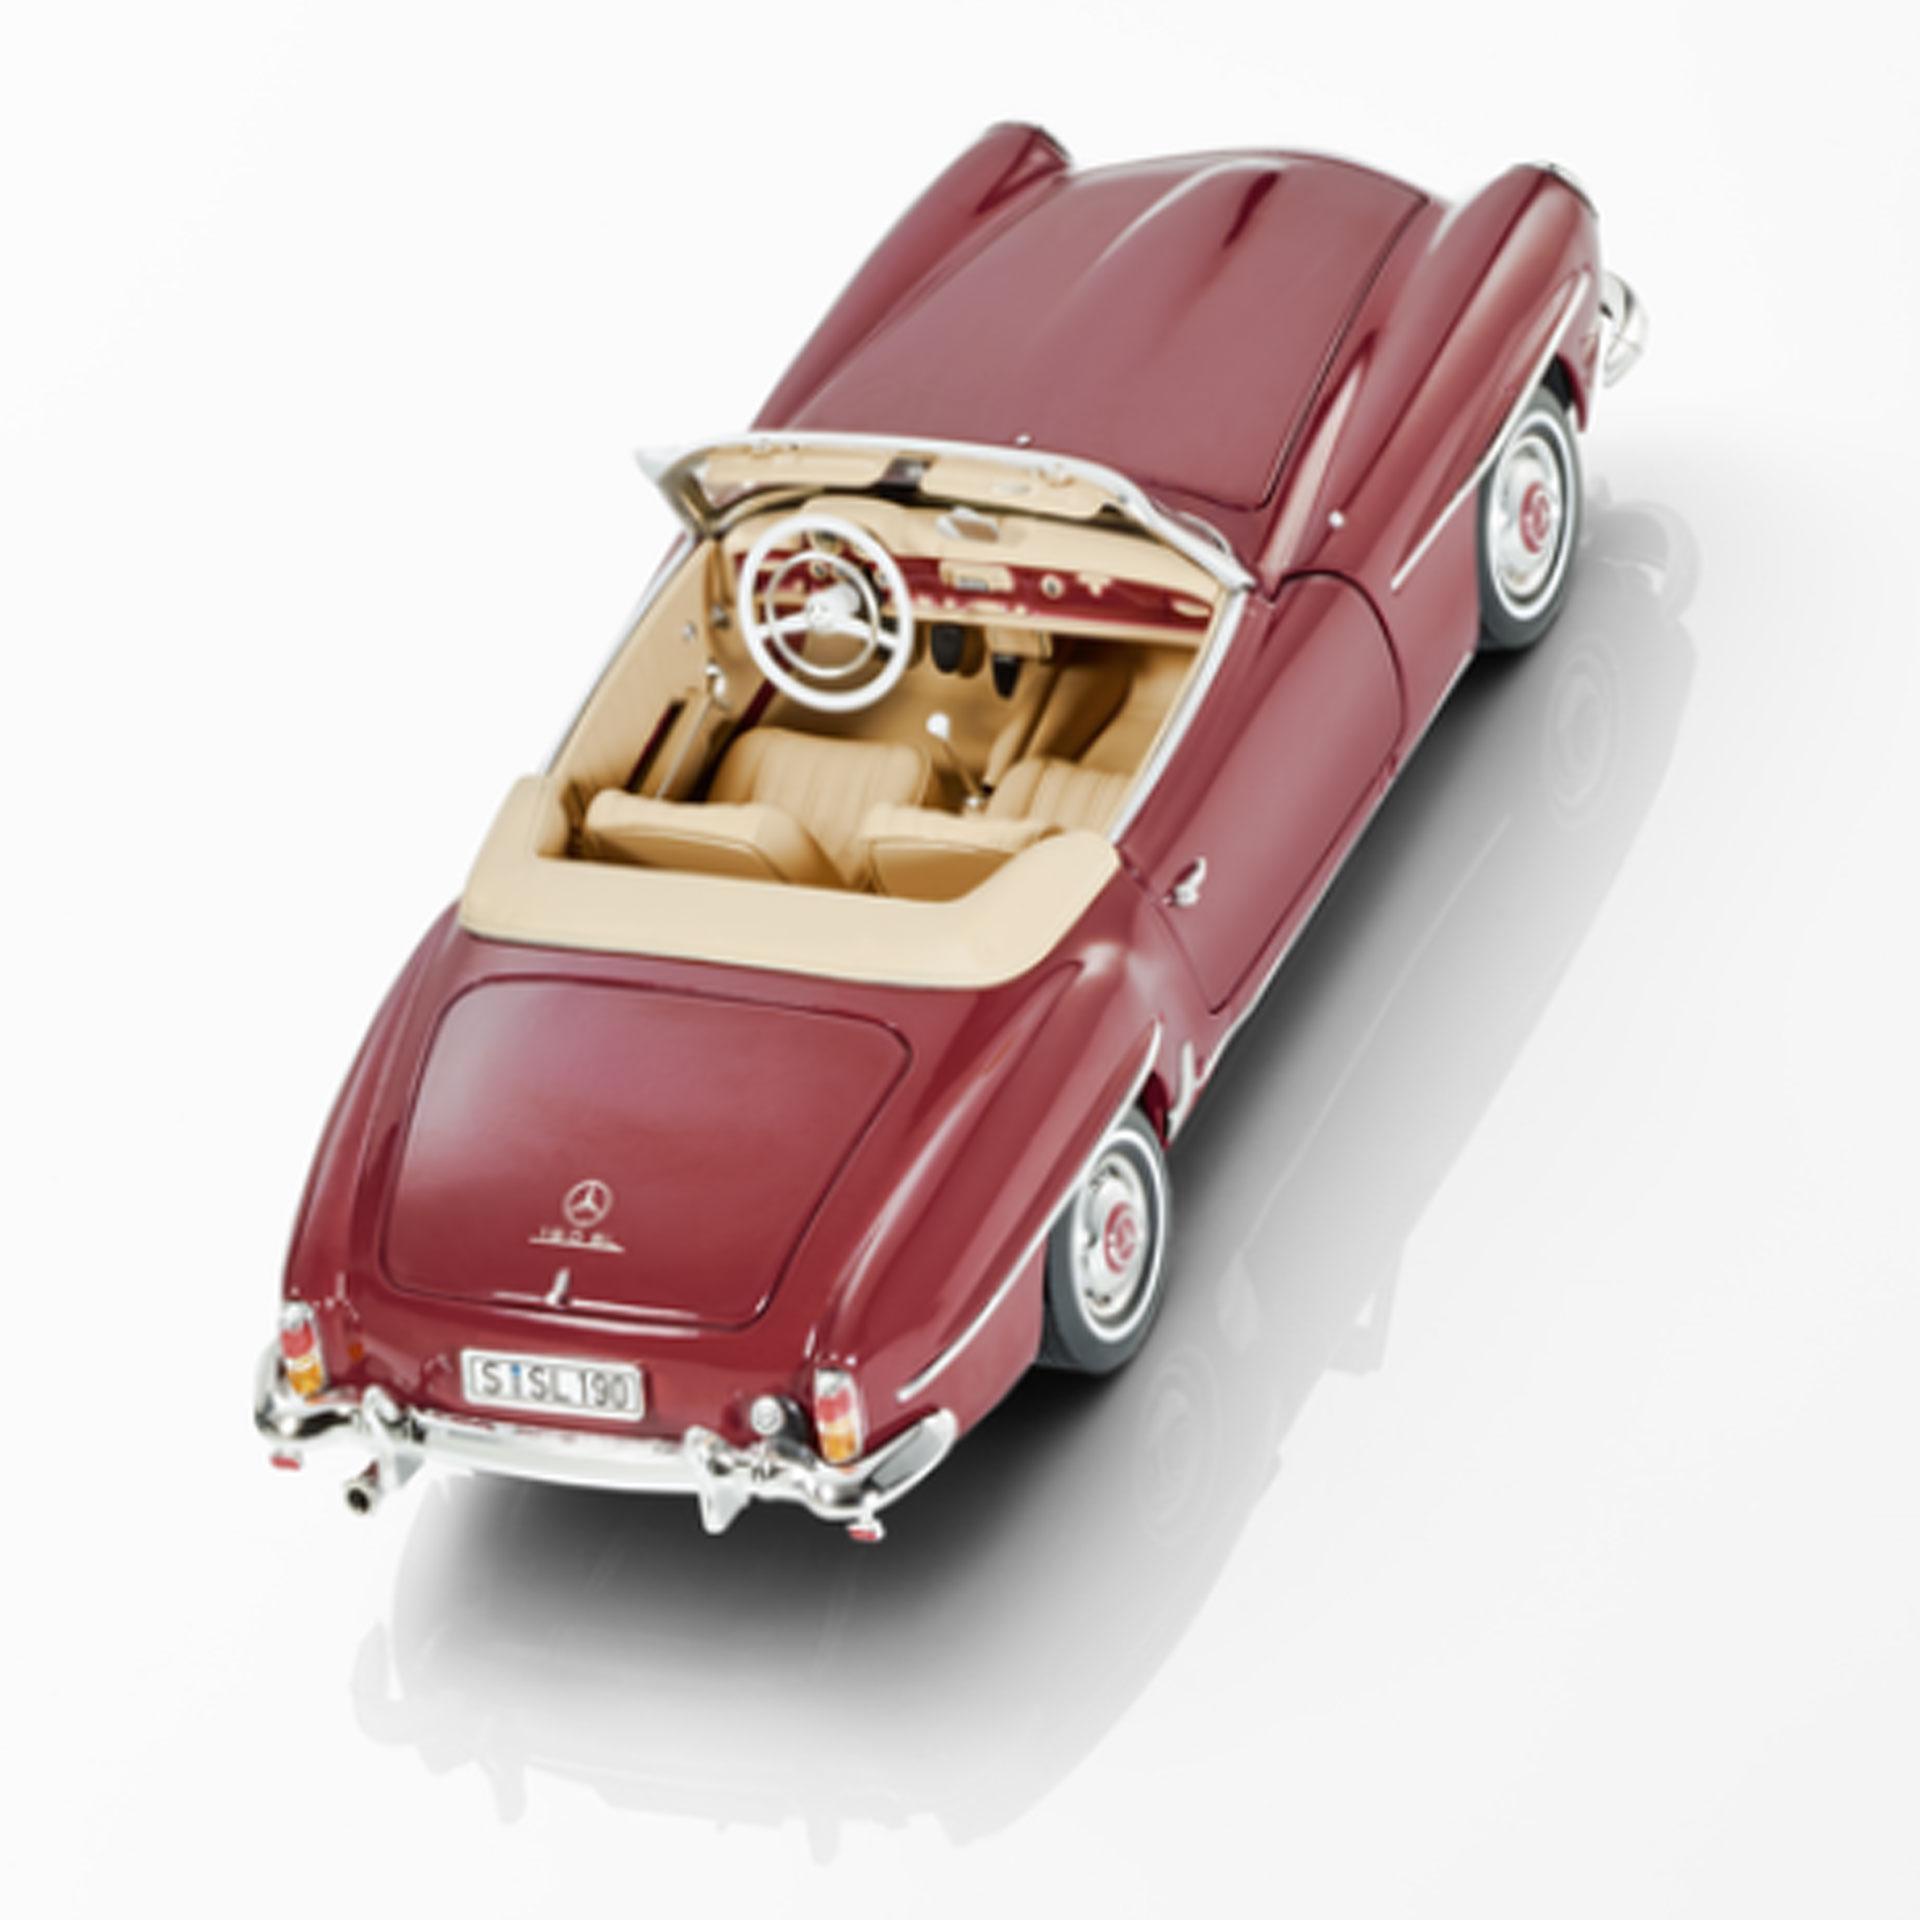 Mercedes-Benz Modellauto 190 SL W 121 (1954-1963) 1:18